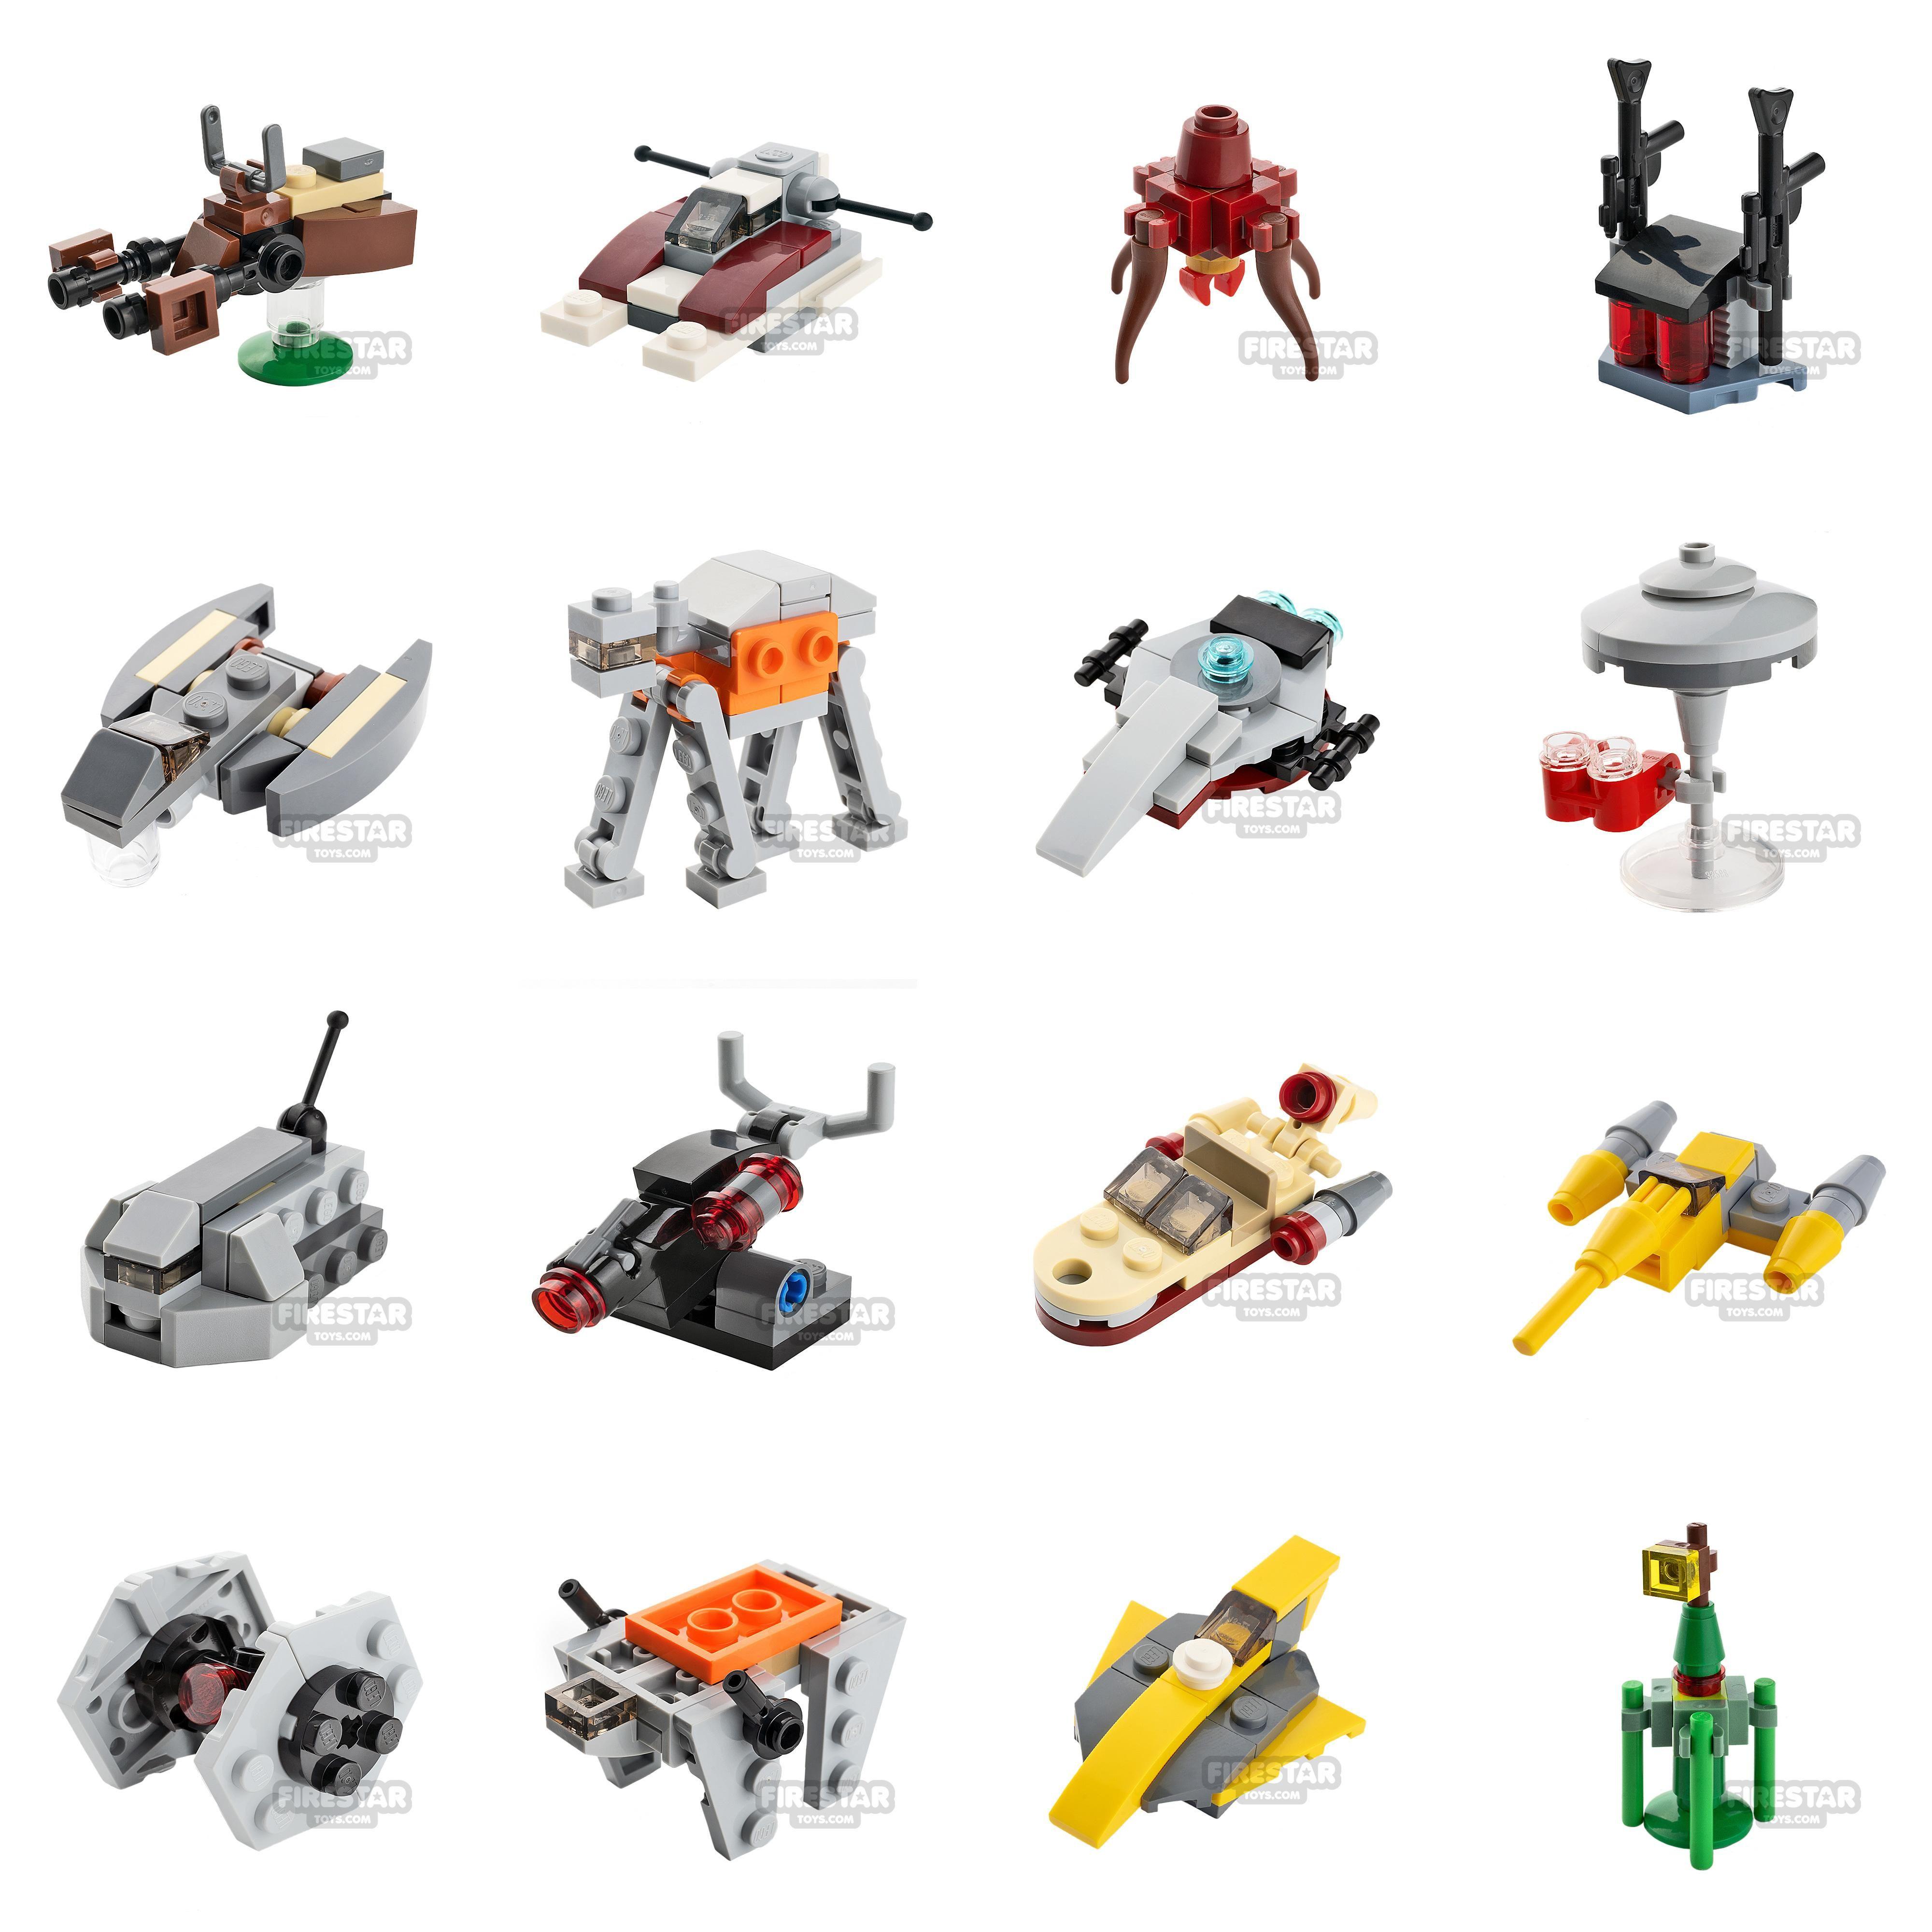 Lego Star Wars Mini By Cosimo Carbonelli On Lego Microscale In